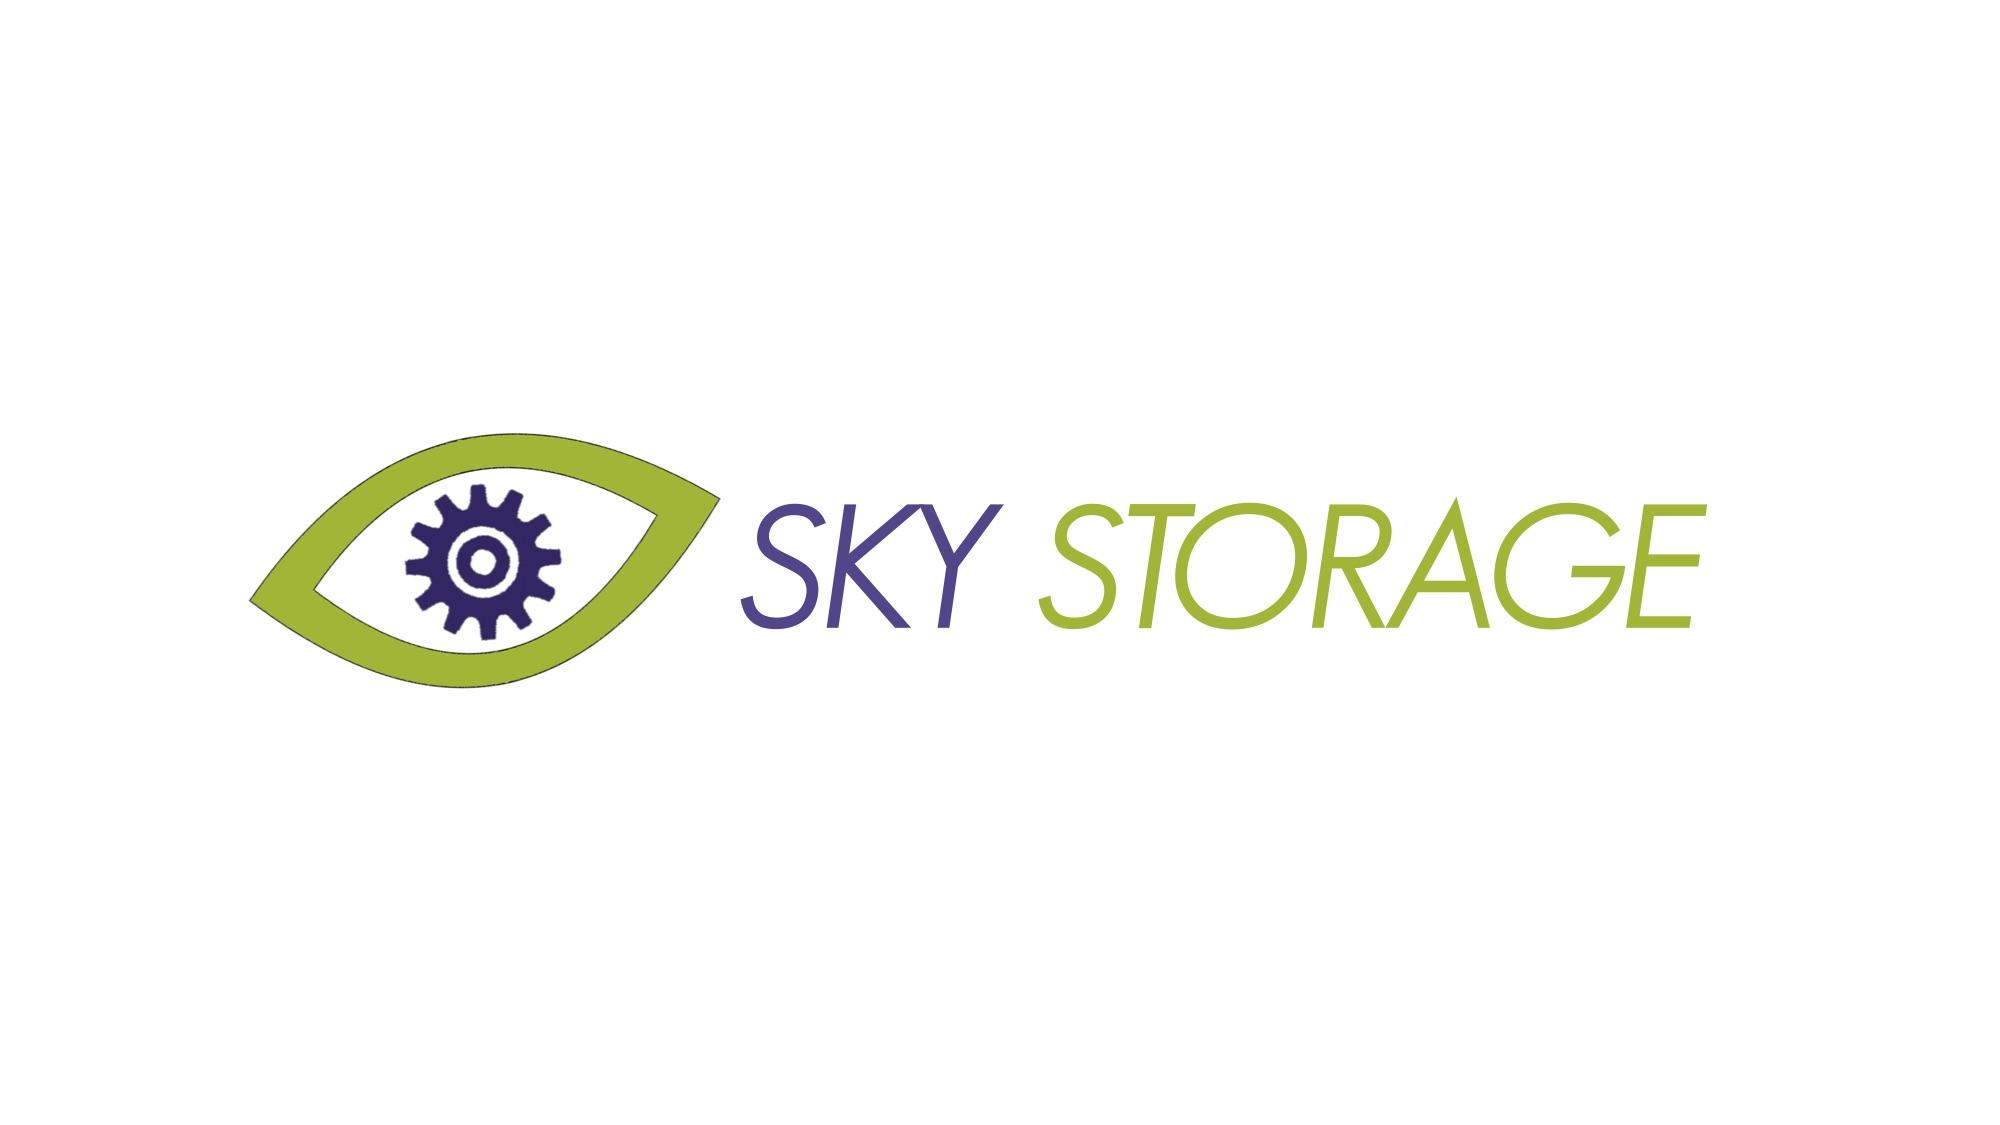 ologo-skymanager-copie-glissées-3.jpg